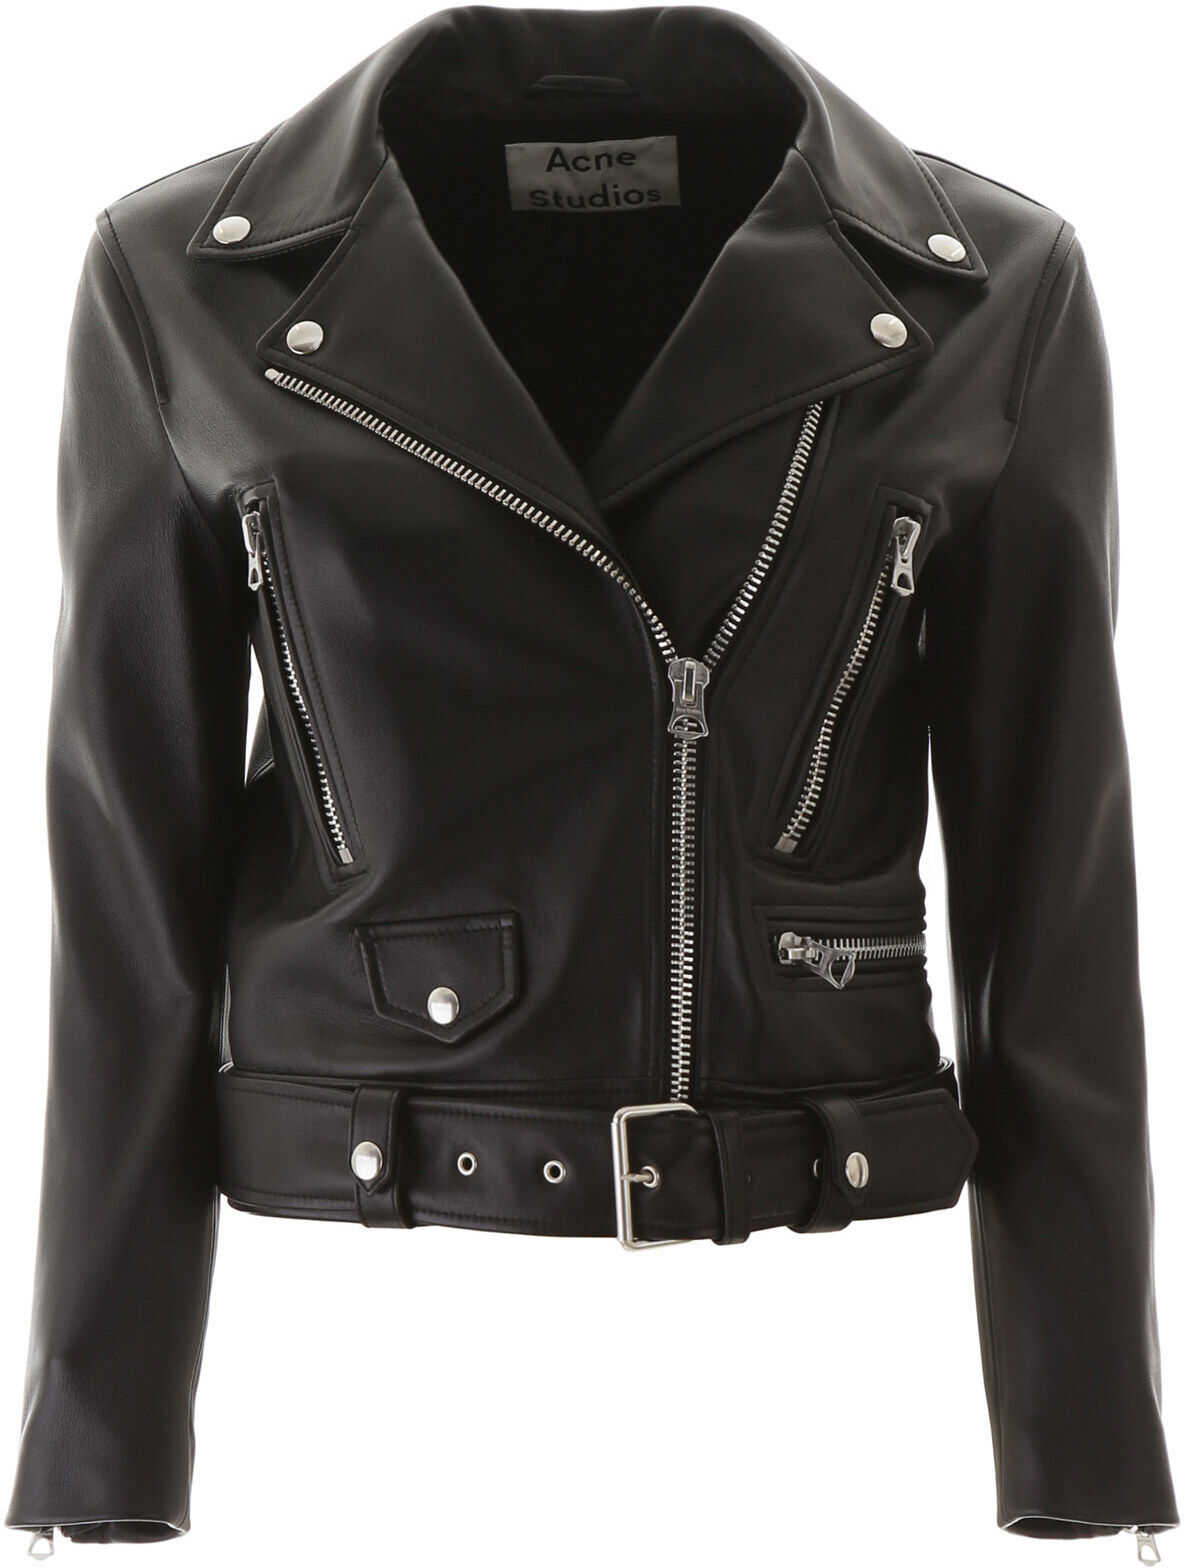 Acne Studios Biker Jacket BLACK